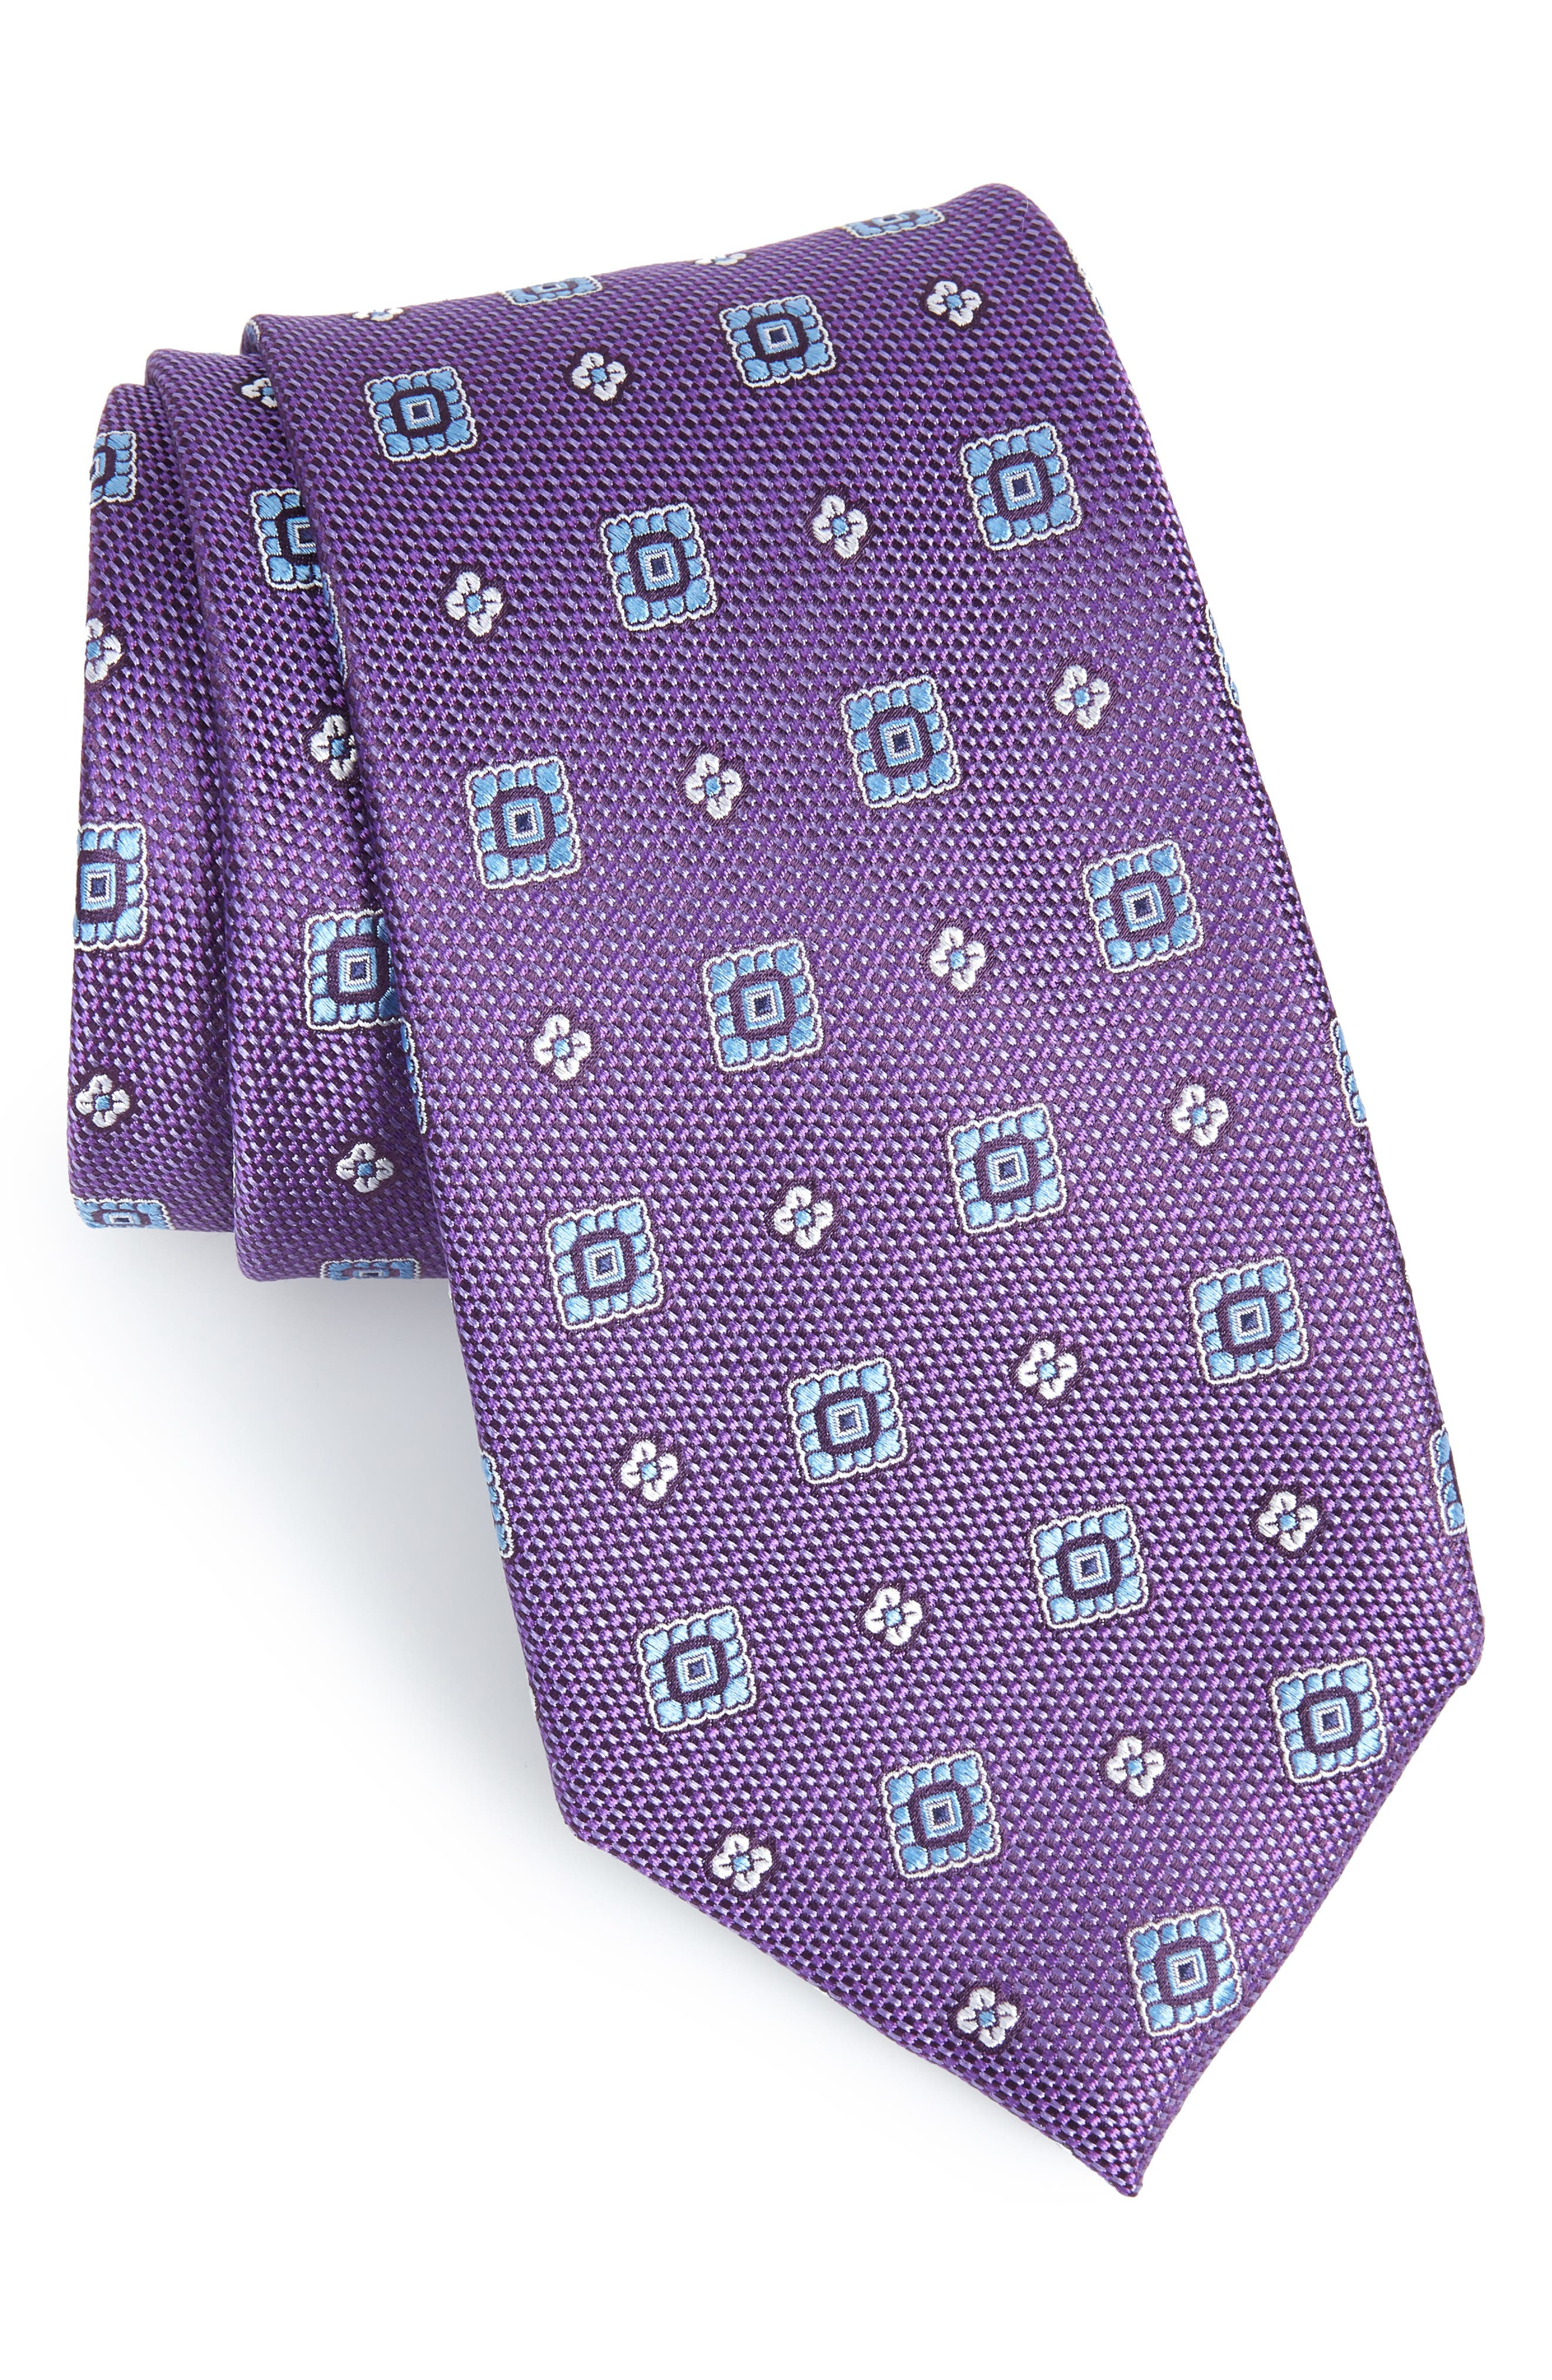 Foxtrot Medallion Silk Tie,                         Main,                         color, EGGPLANT